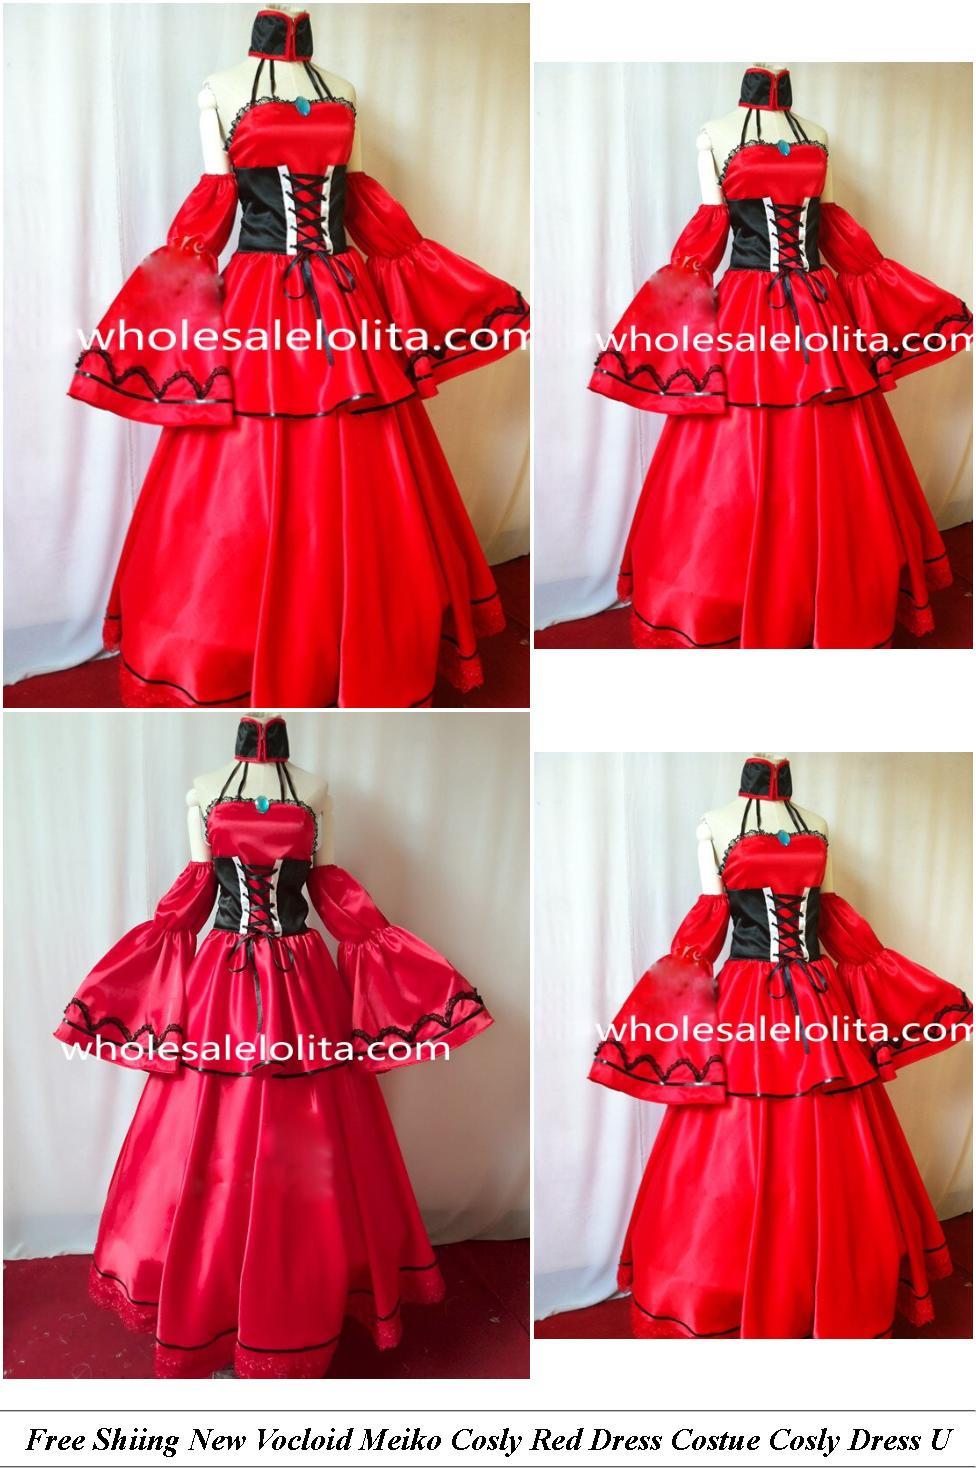 Retro Dresses Plus Size Uk - Womens Clothing Shopping - Celerity Dresses For Less